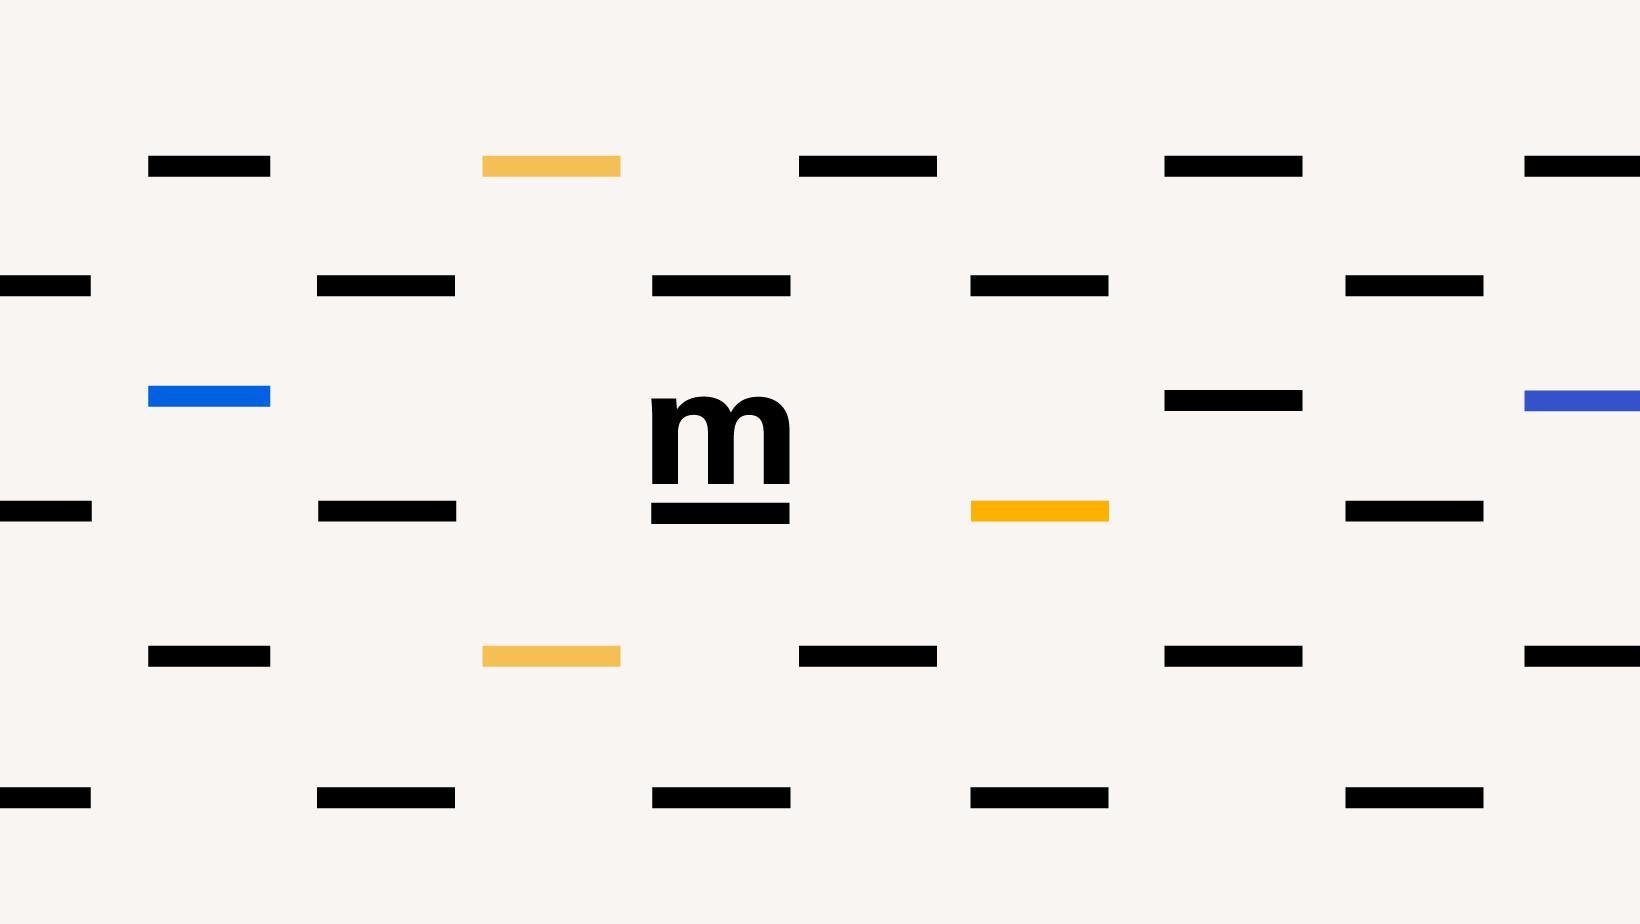 mStable در اوایل عرضه توکن خود به سرمایهگذاران، عقب نشینی کرد